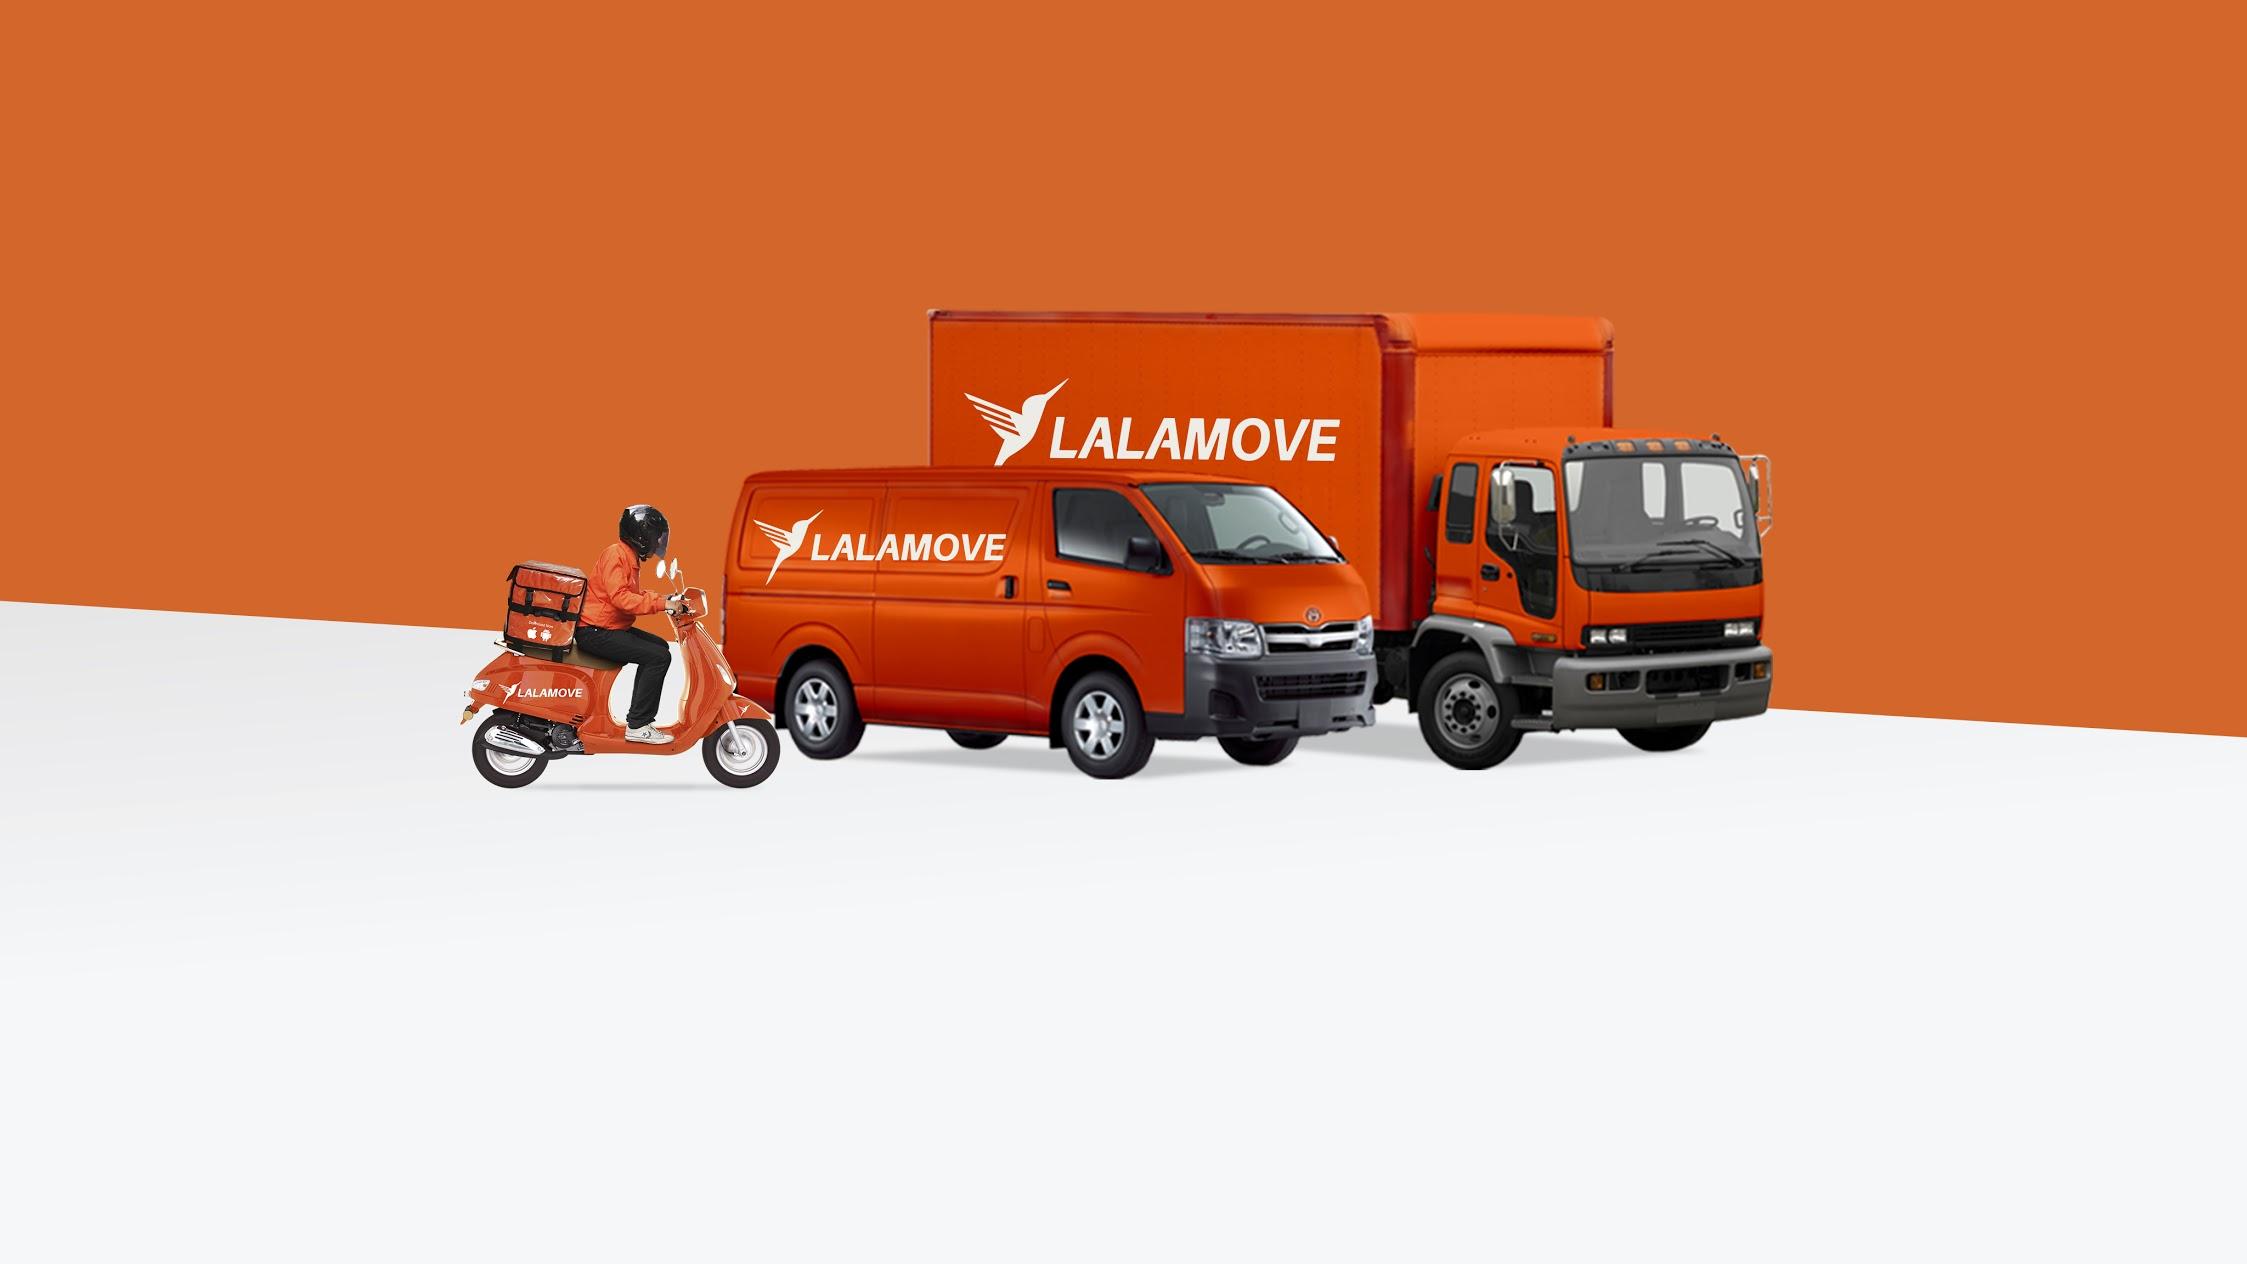 Lalamove (HK)